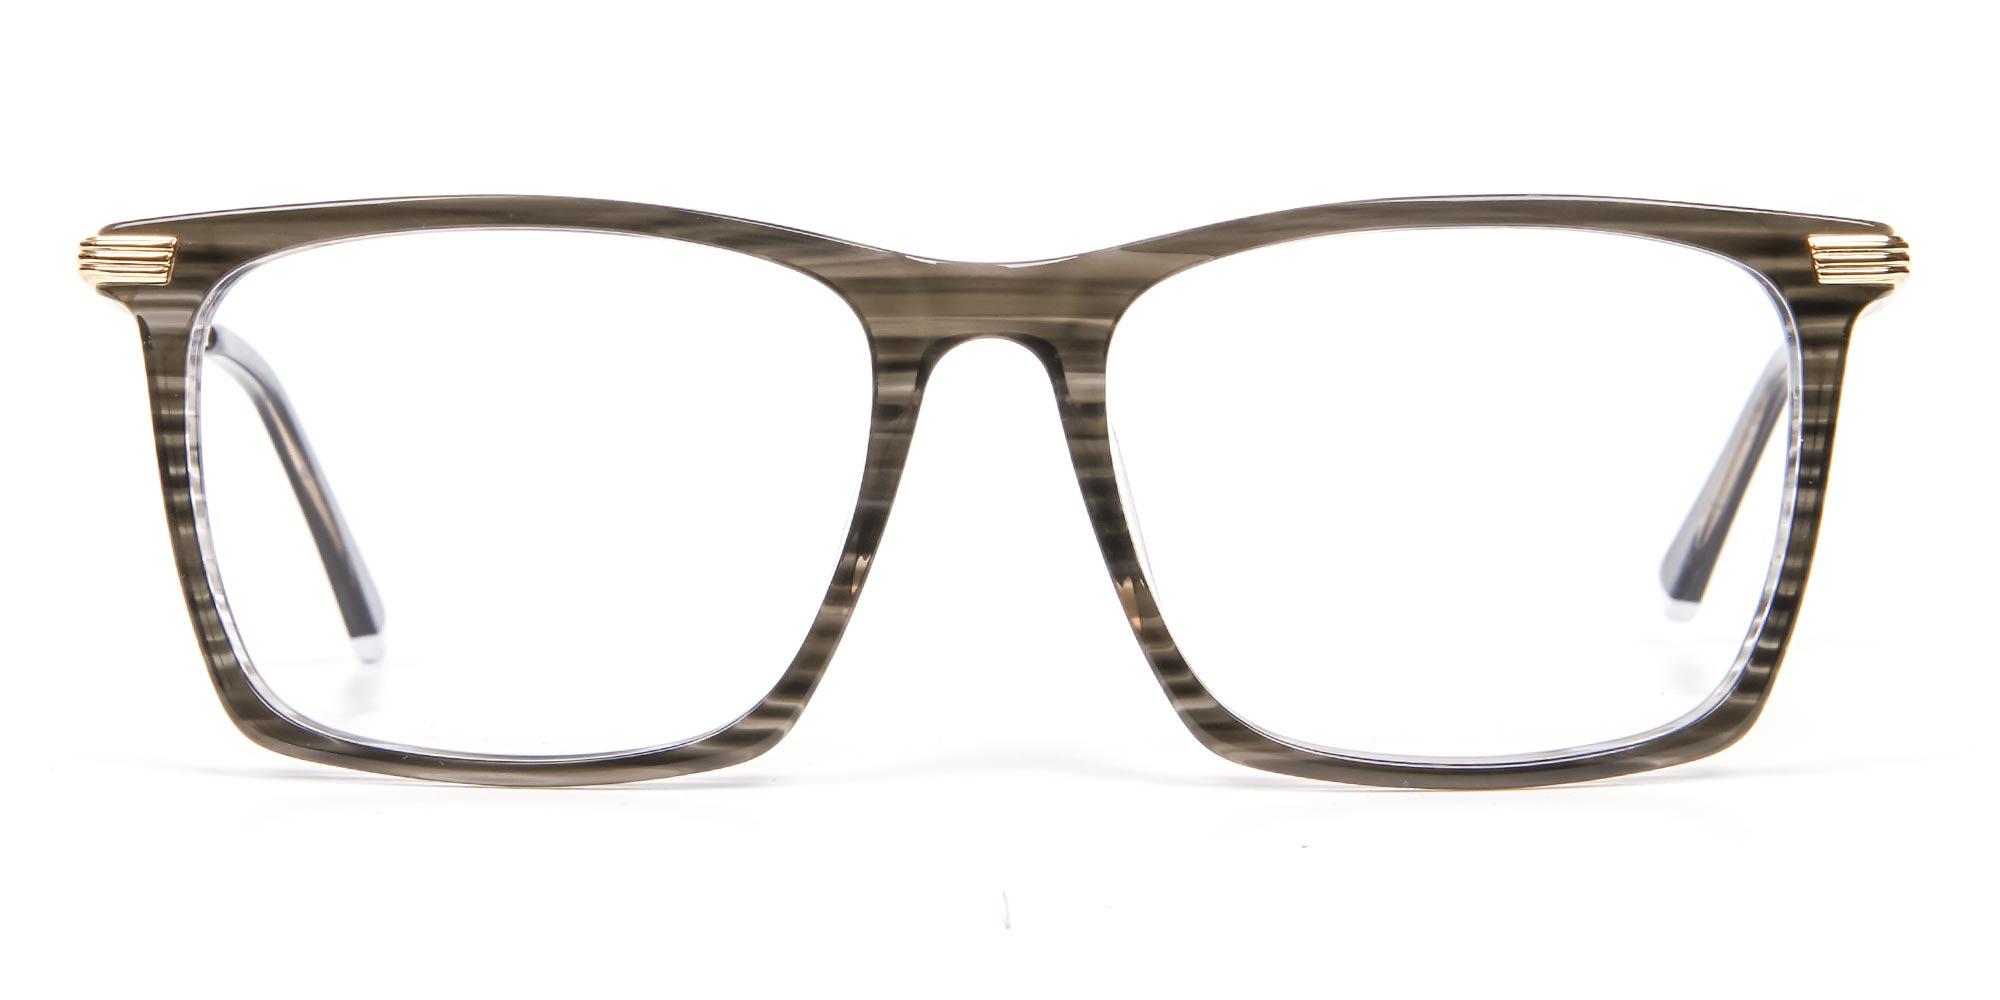 Black Wooden Textured Glasses